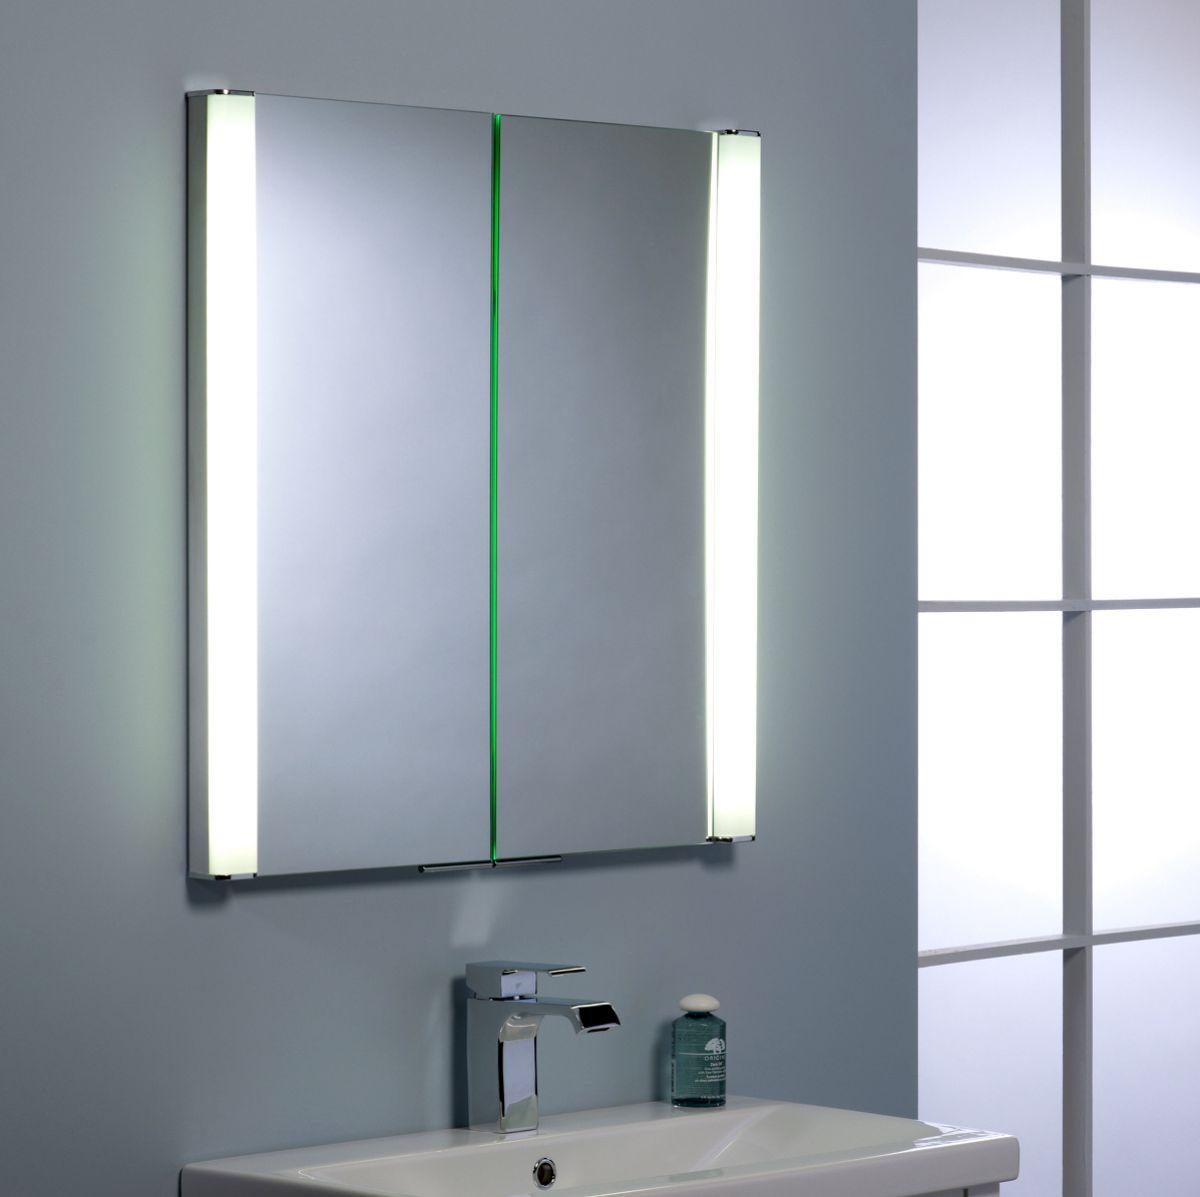 Roper Rhodes Transition Illuminated Recessible Cabinet